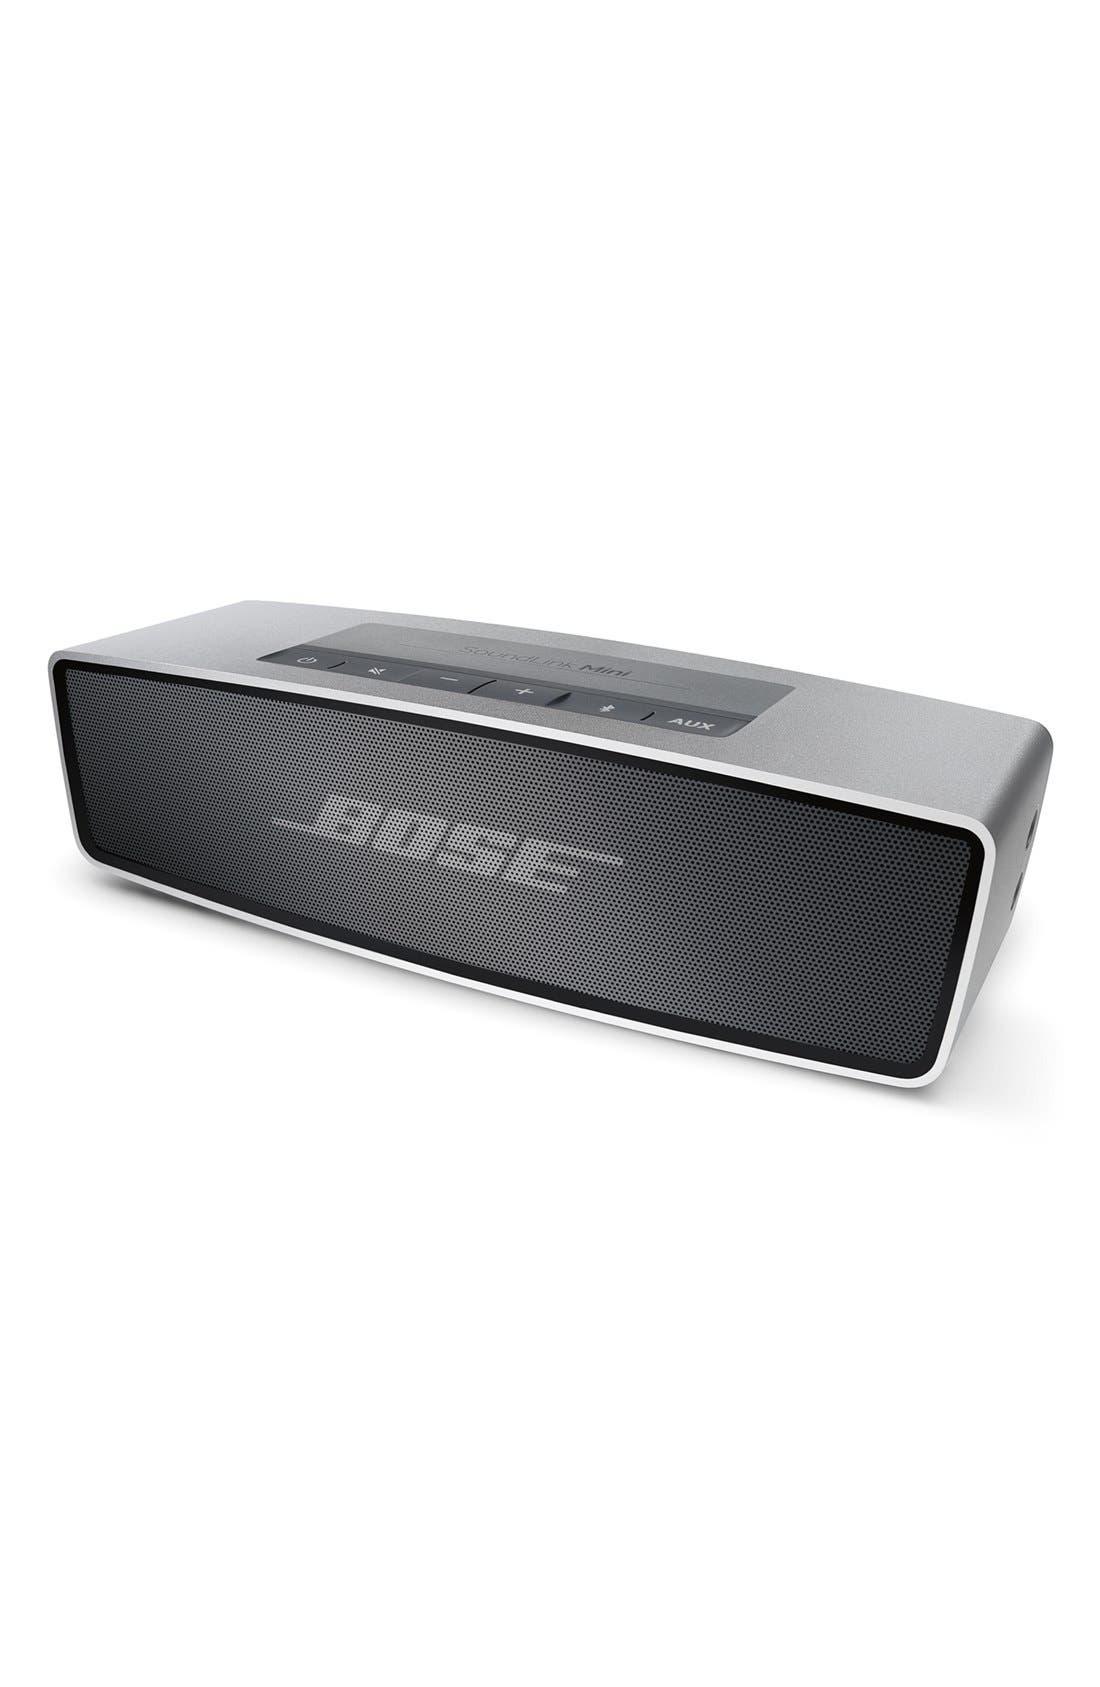 Alternate Image 1 Selected - Bose® SoundLink® Mini Bluetooth® Speaker